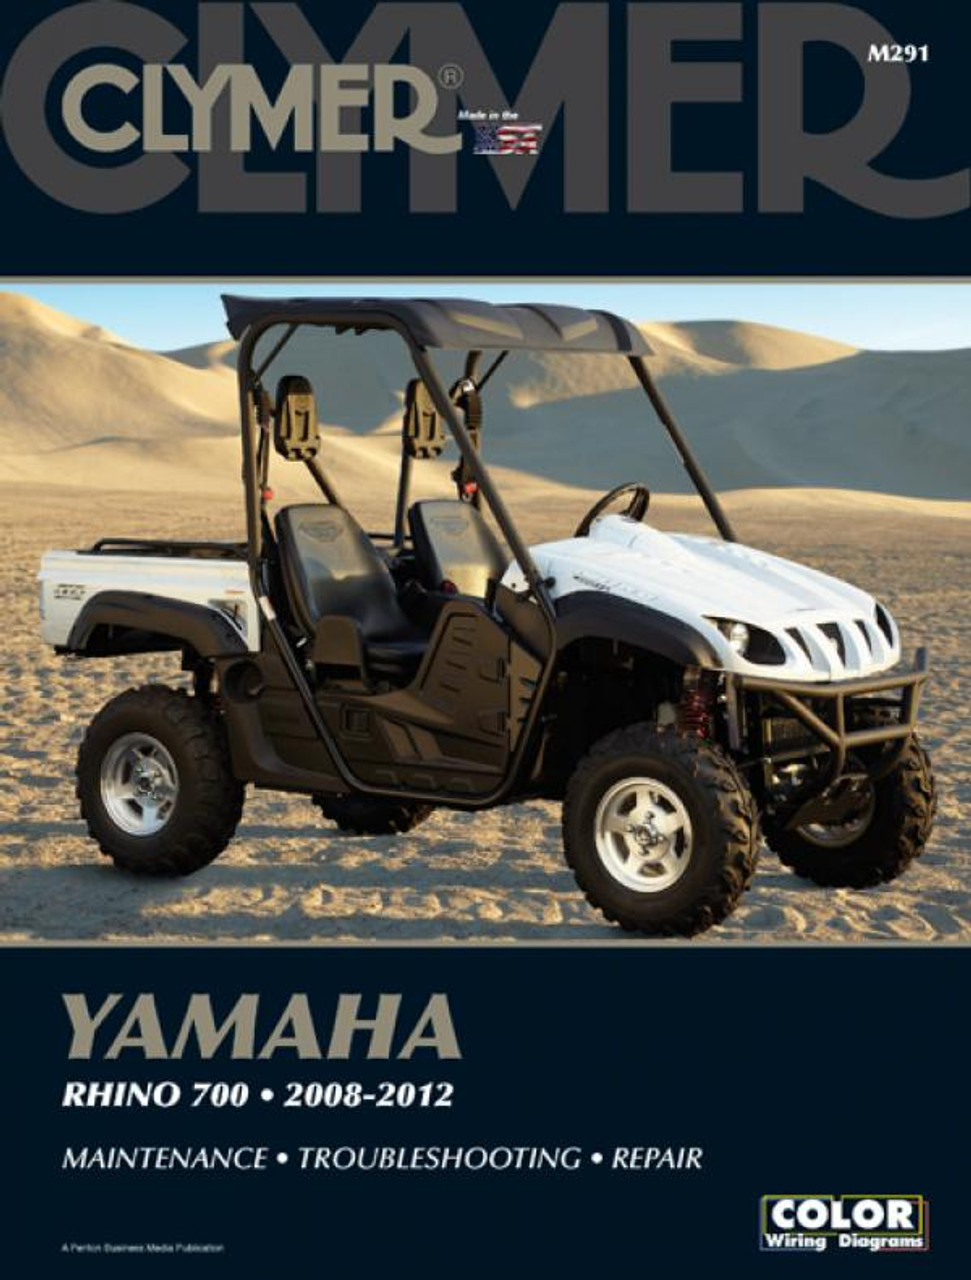 small resolution of yamaha rhino 700 atvs 2008 2012 clymer workshop manual yamaha rhino 700 vacuum diagram